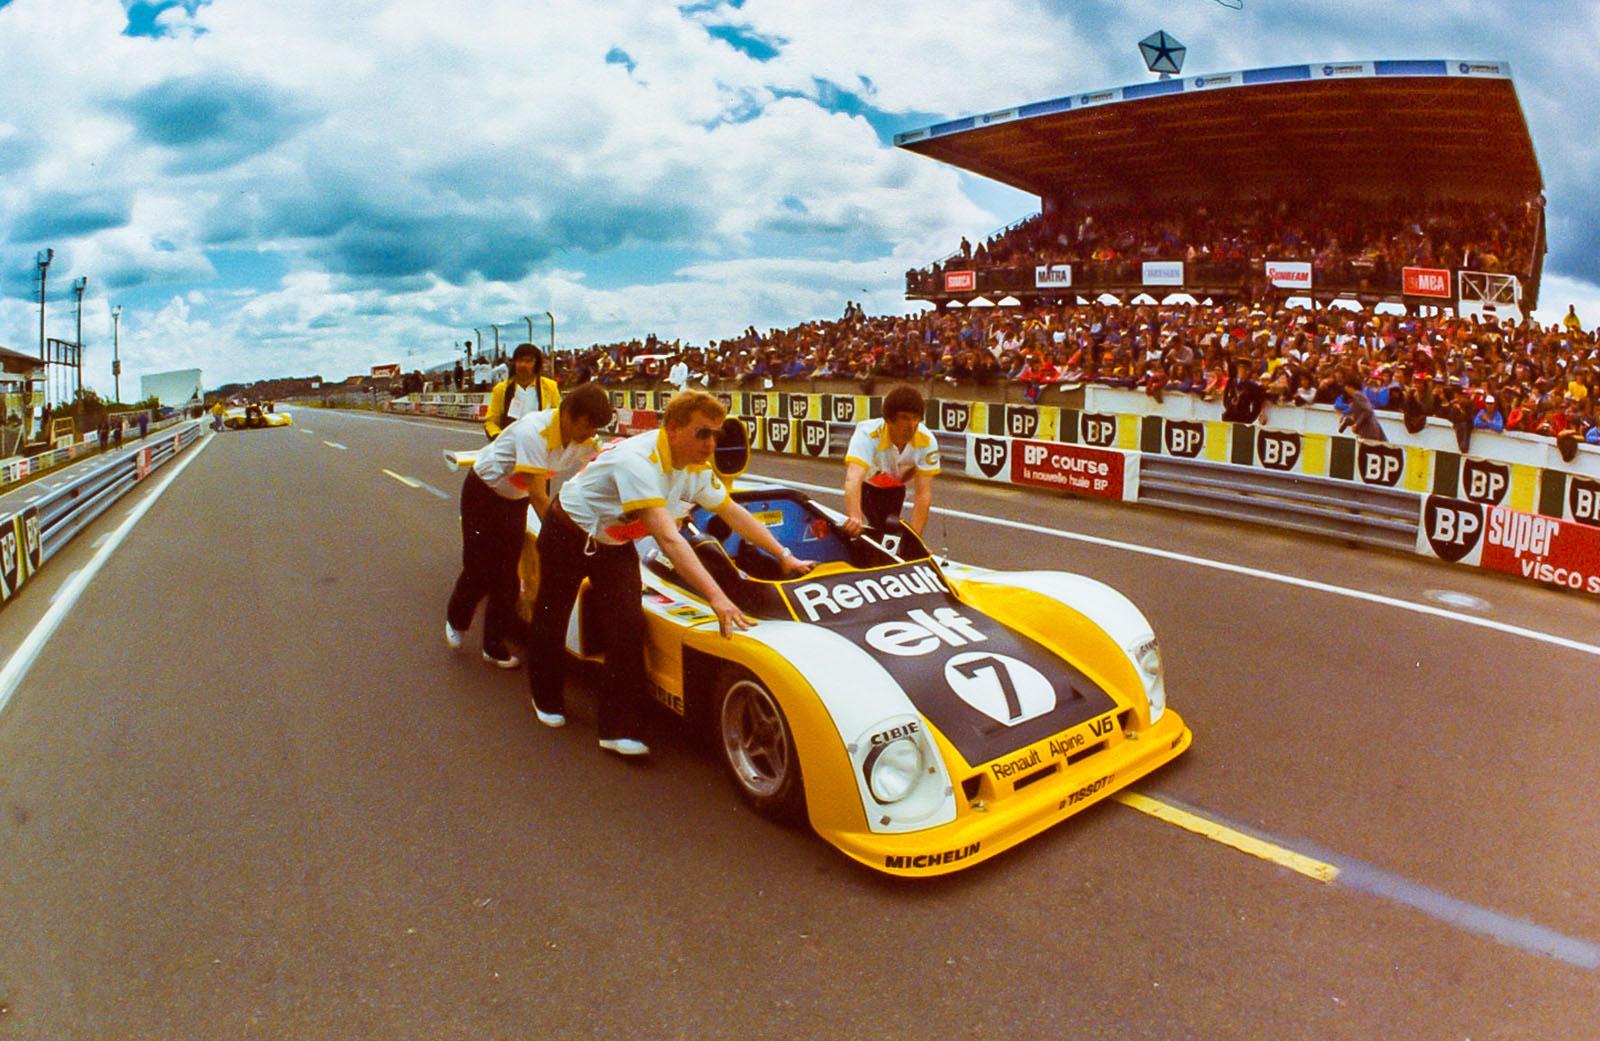 Bil #7 klargjøres til start på Le Mans foran 1977-løpet.